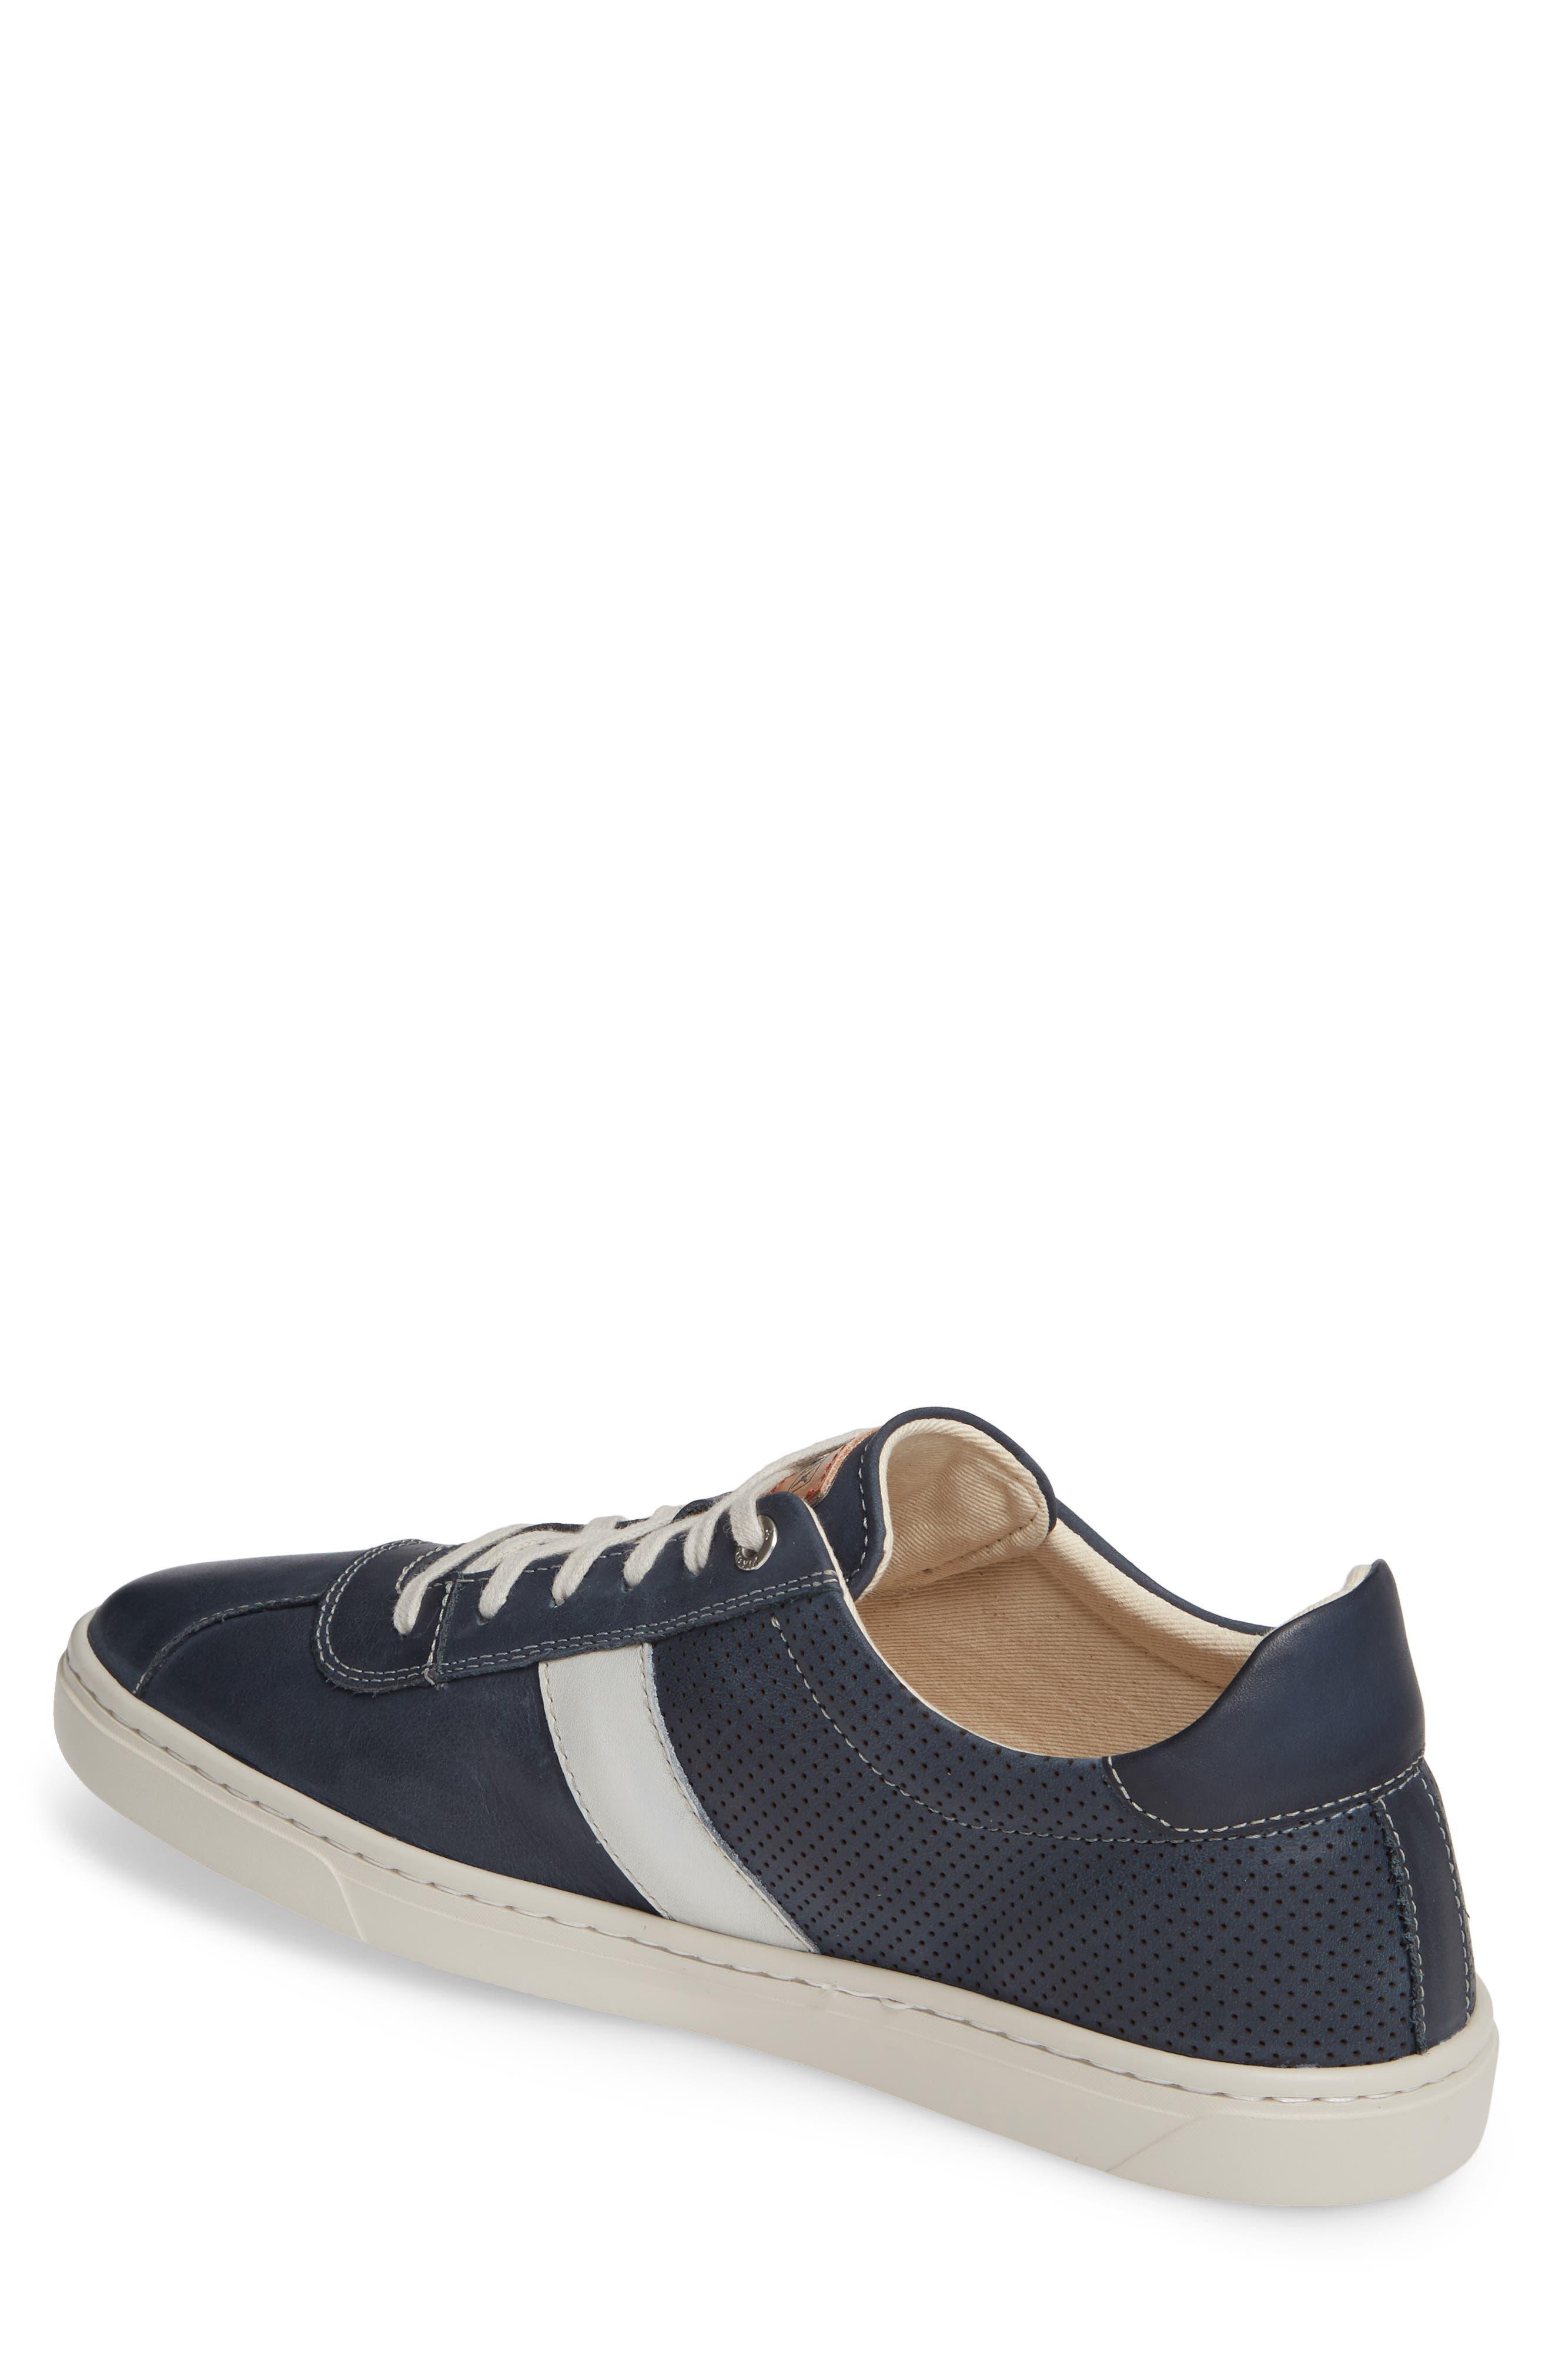 PIKOLINOS, Belfort Perforated Sneaker, Alternate thumbnail 2, color, BLUE